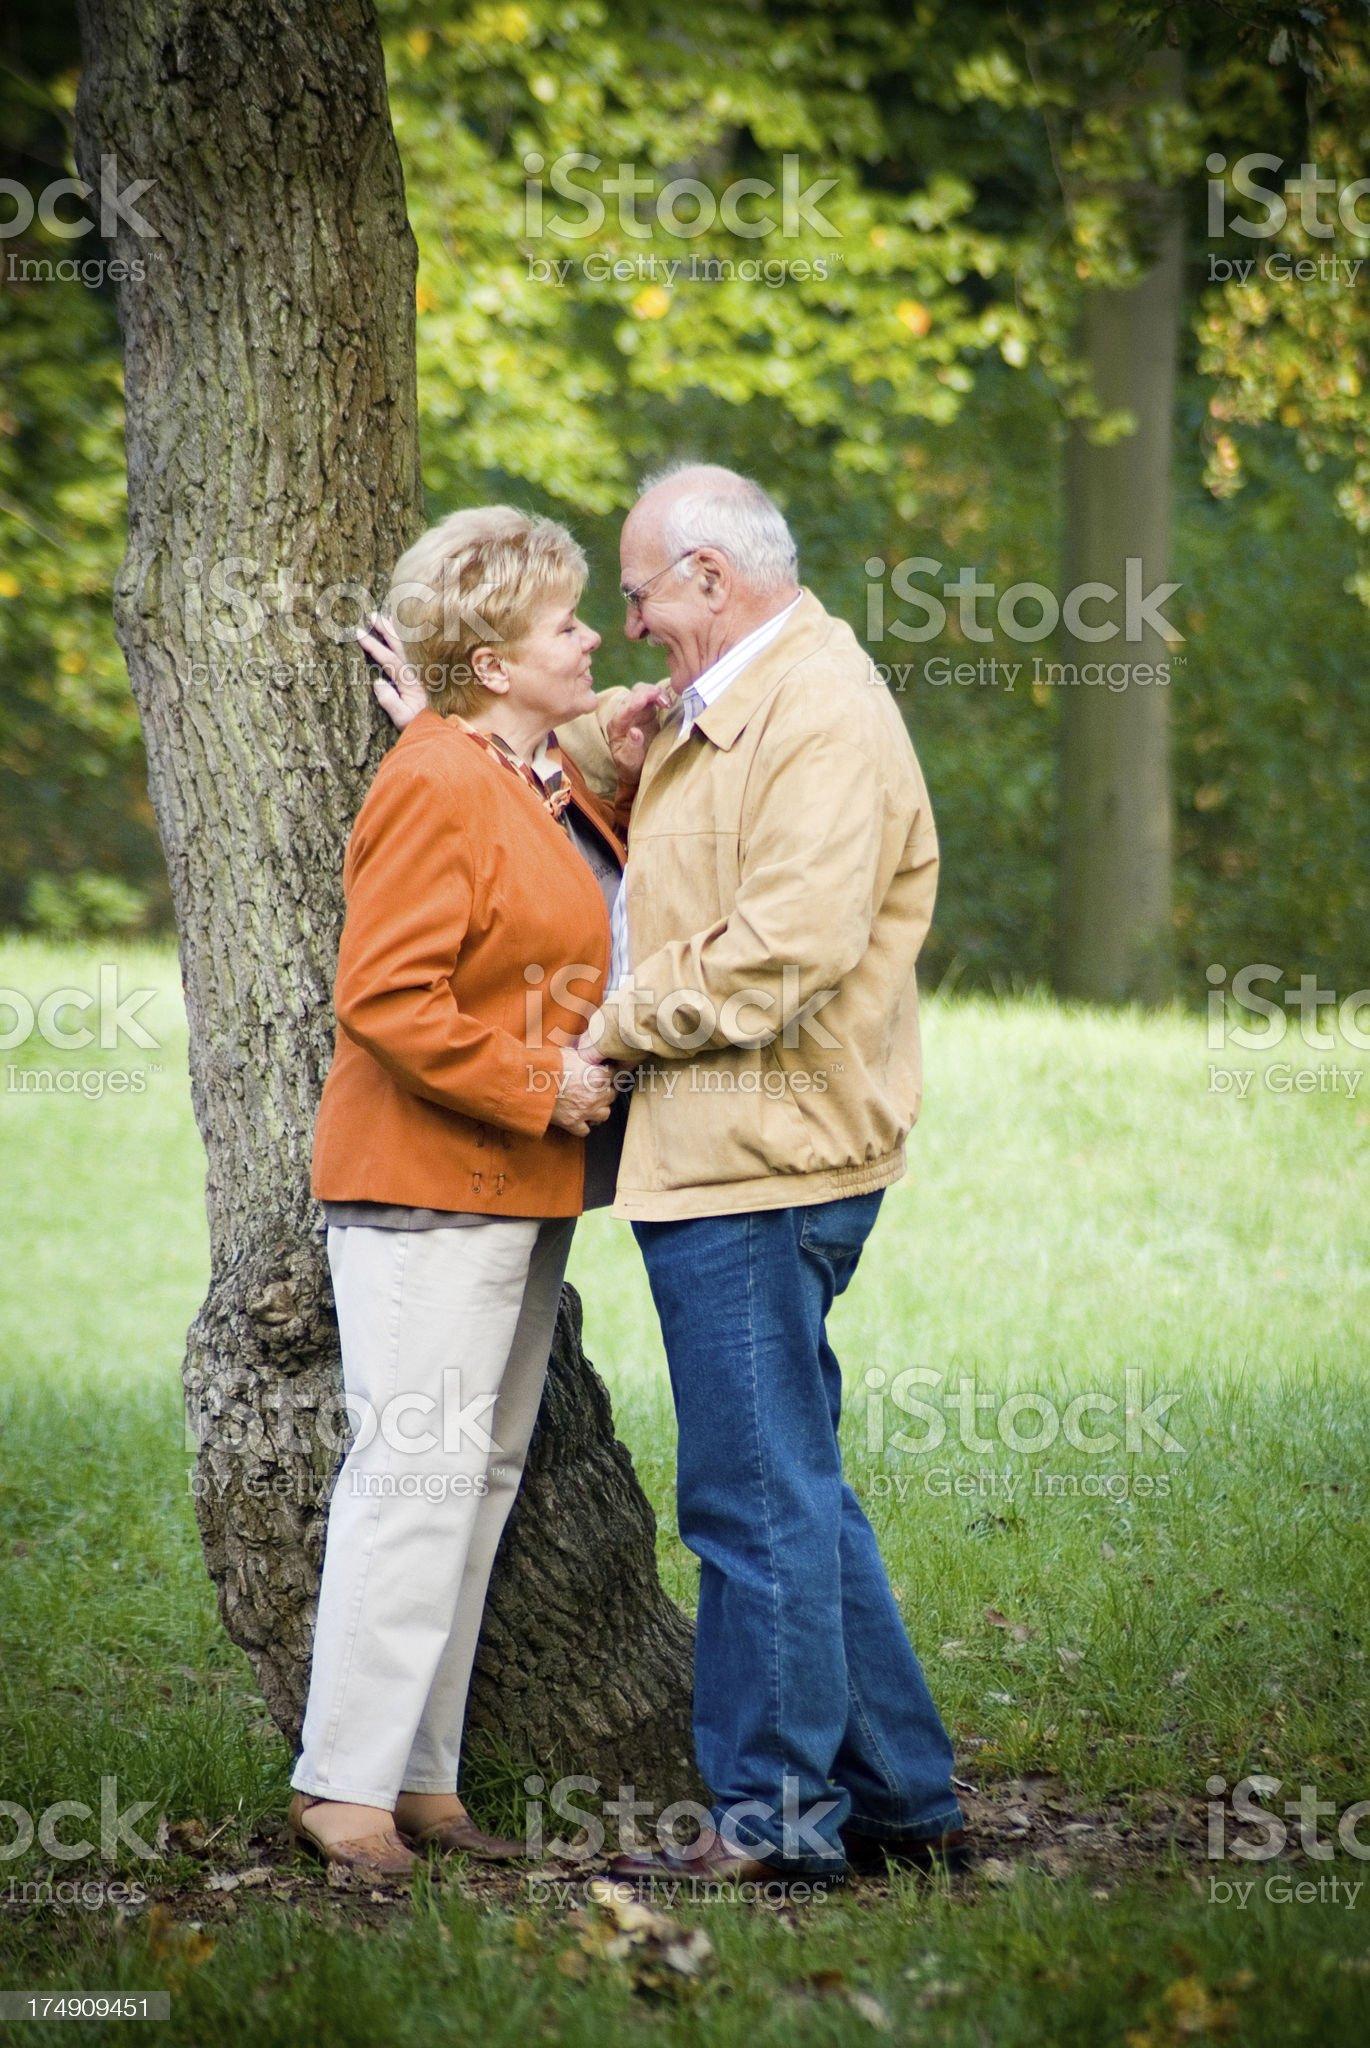 Active Seniors Series royalty-free stock photo